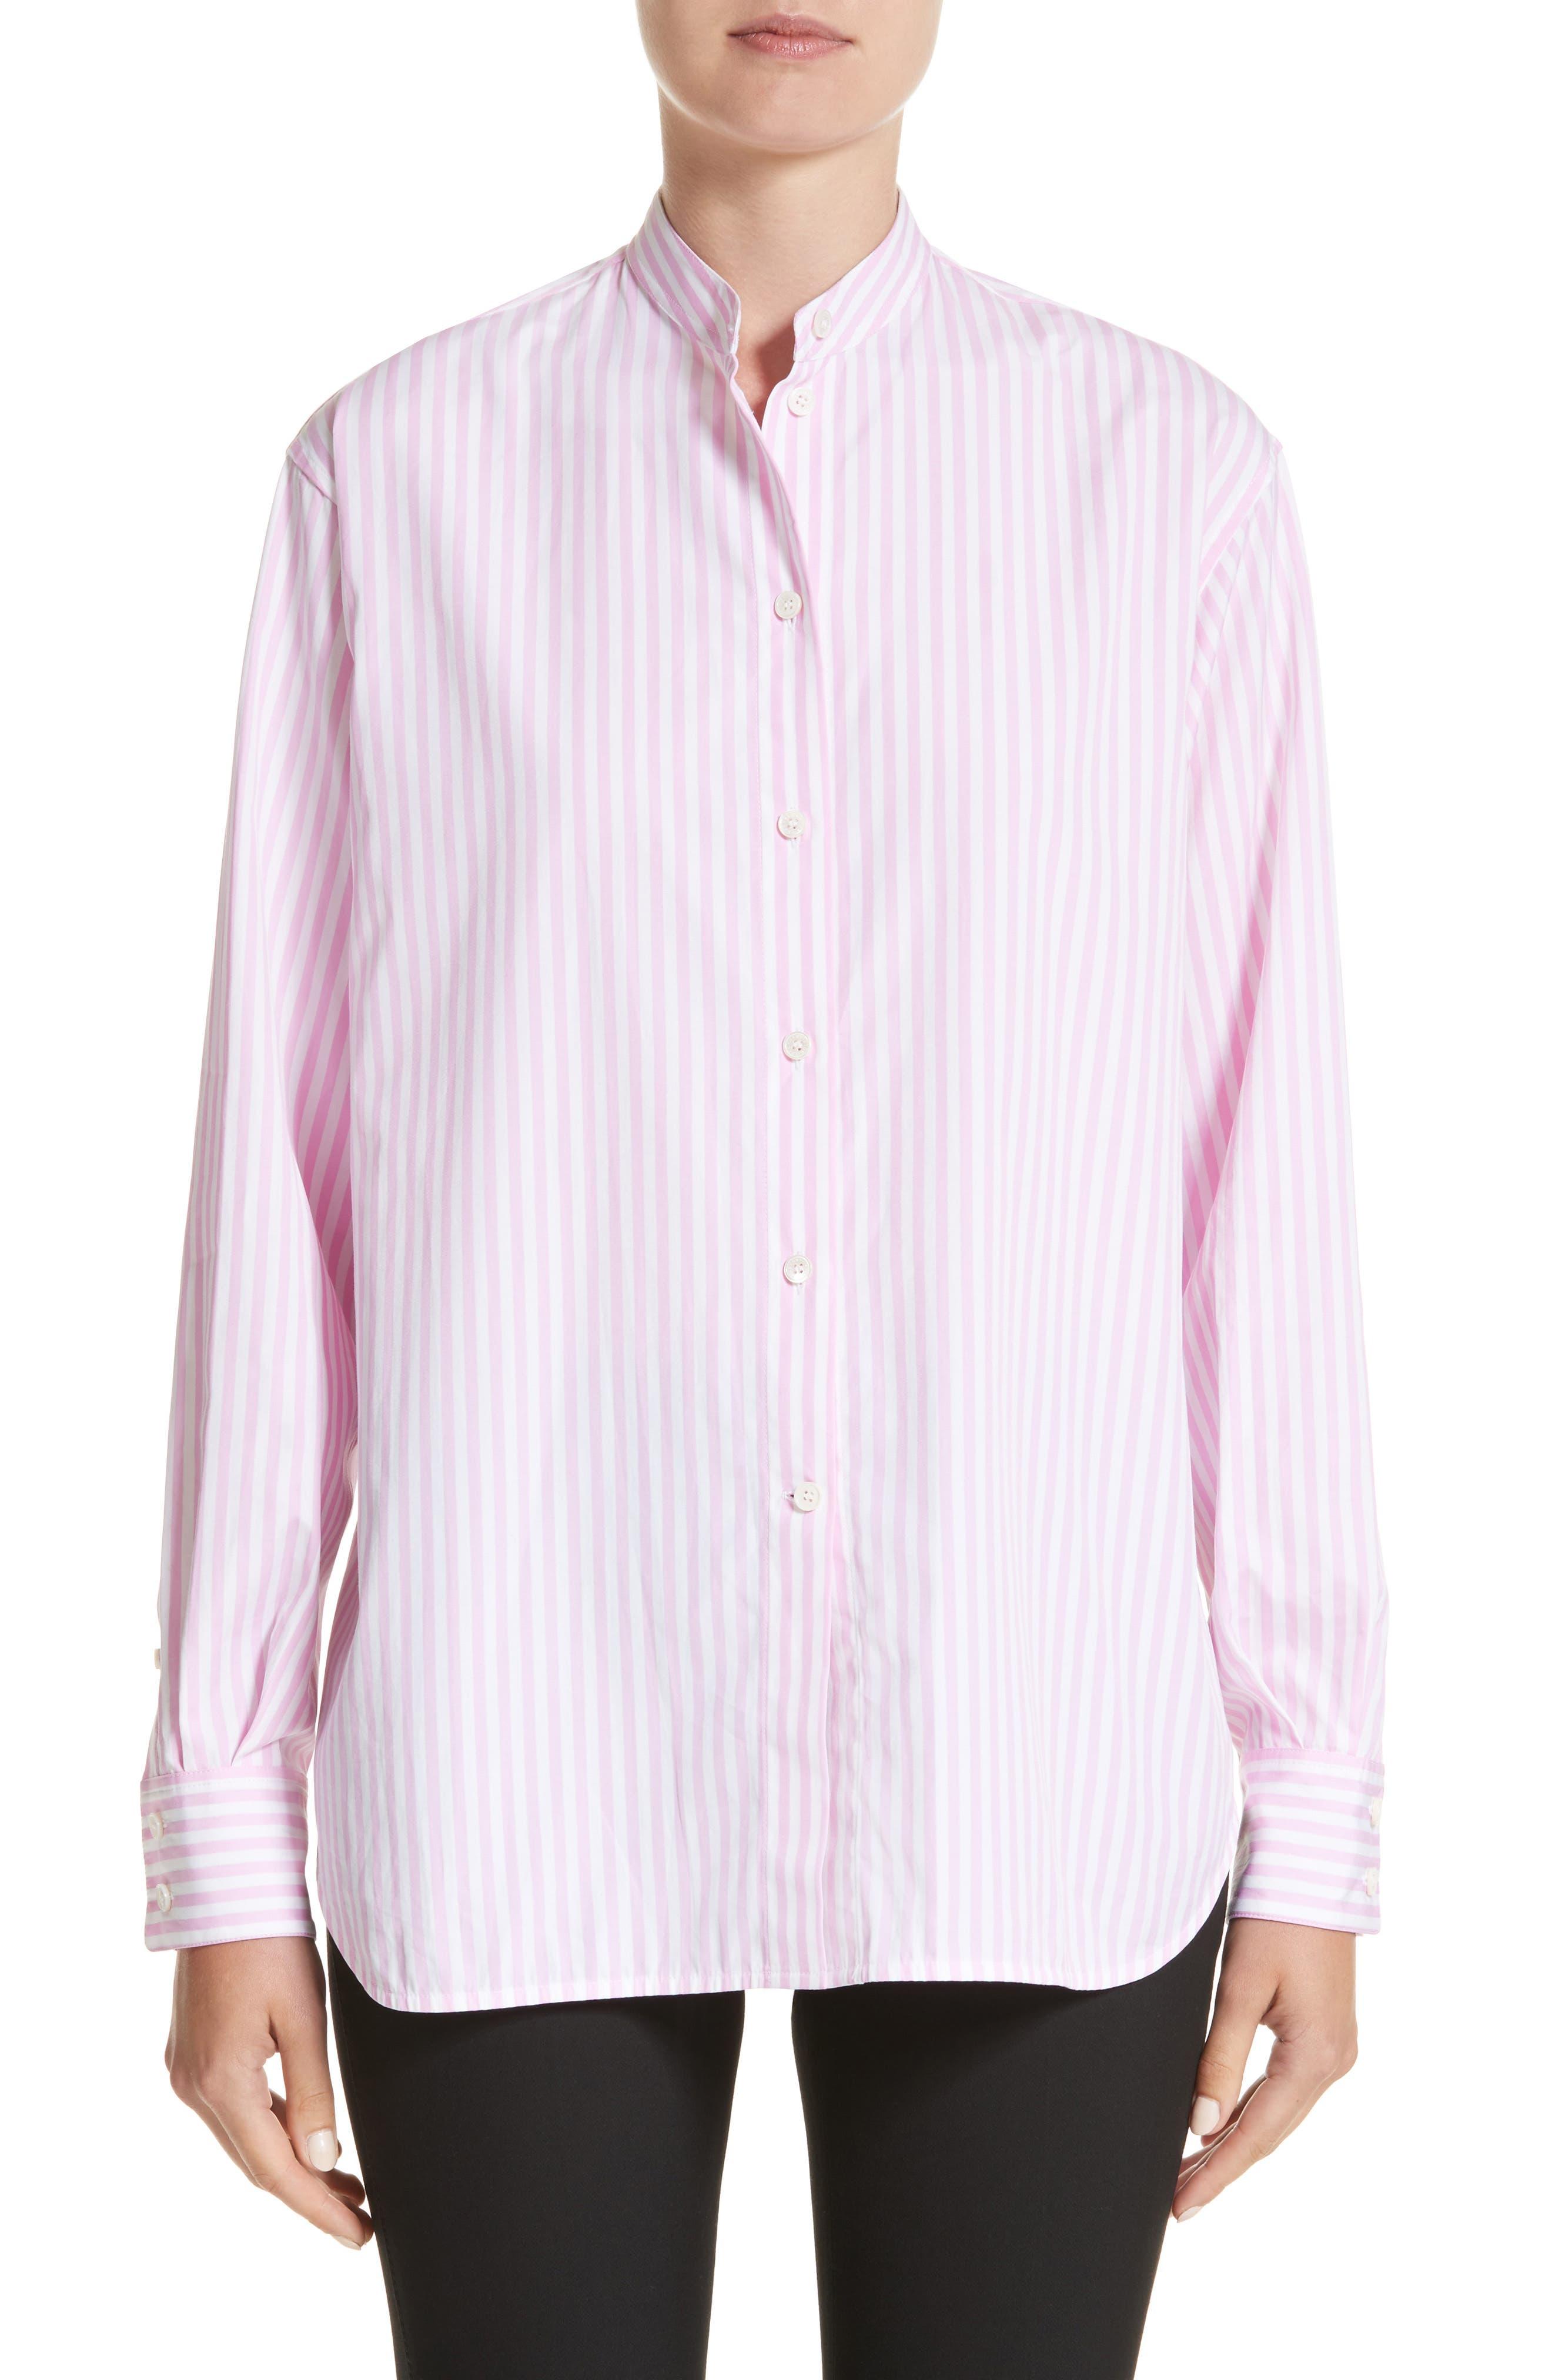 Cotton Grandad Shirt,                         Main,                         color, White/ Rose Pink